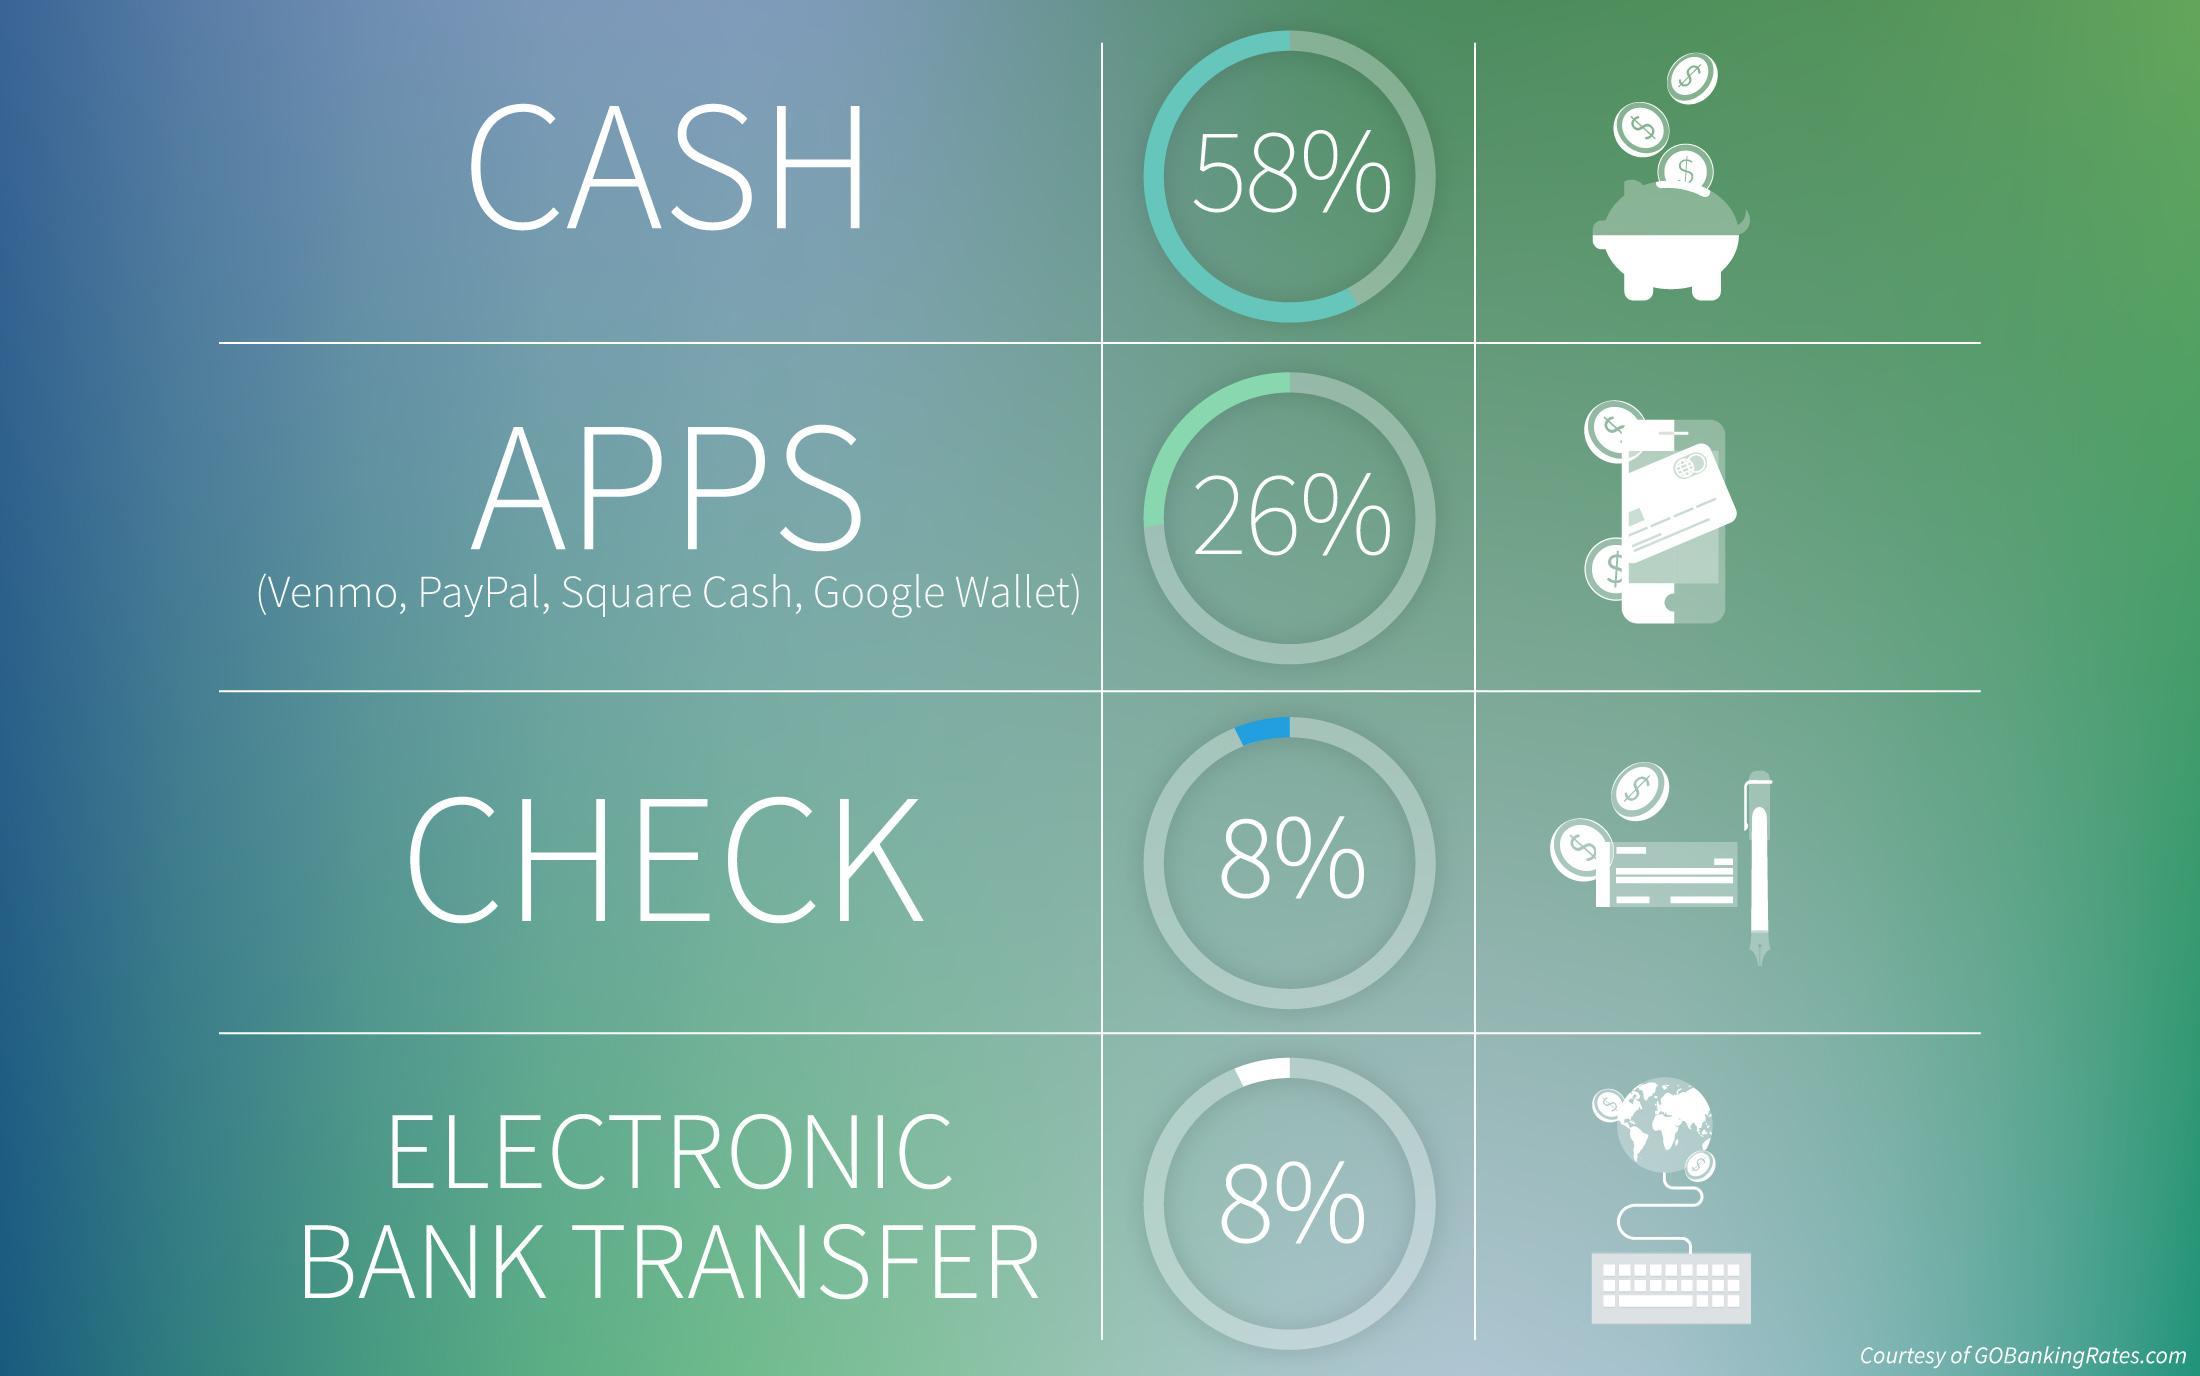 Survey: Millennials Prefer Cash to Other Payment Methods